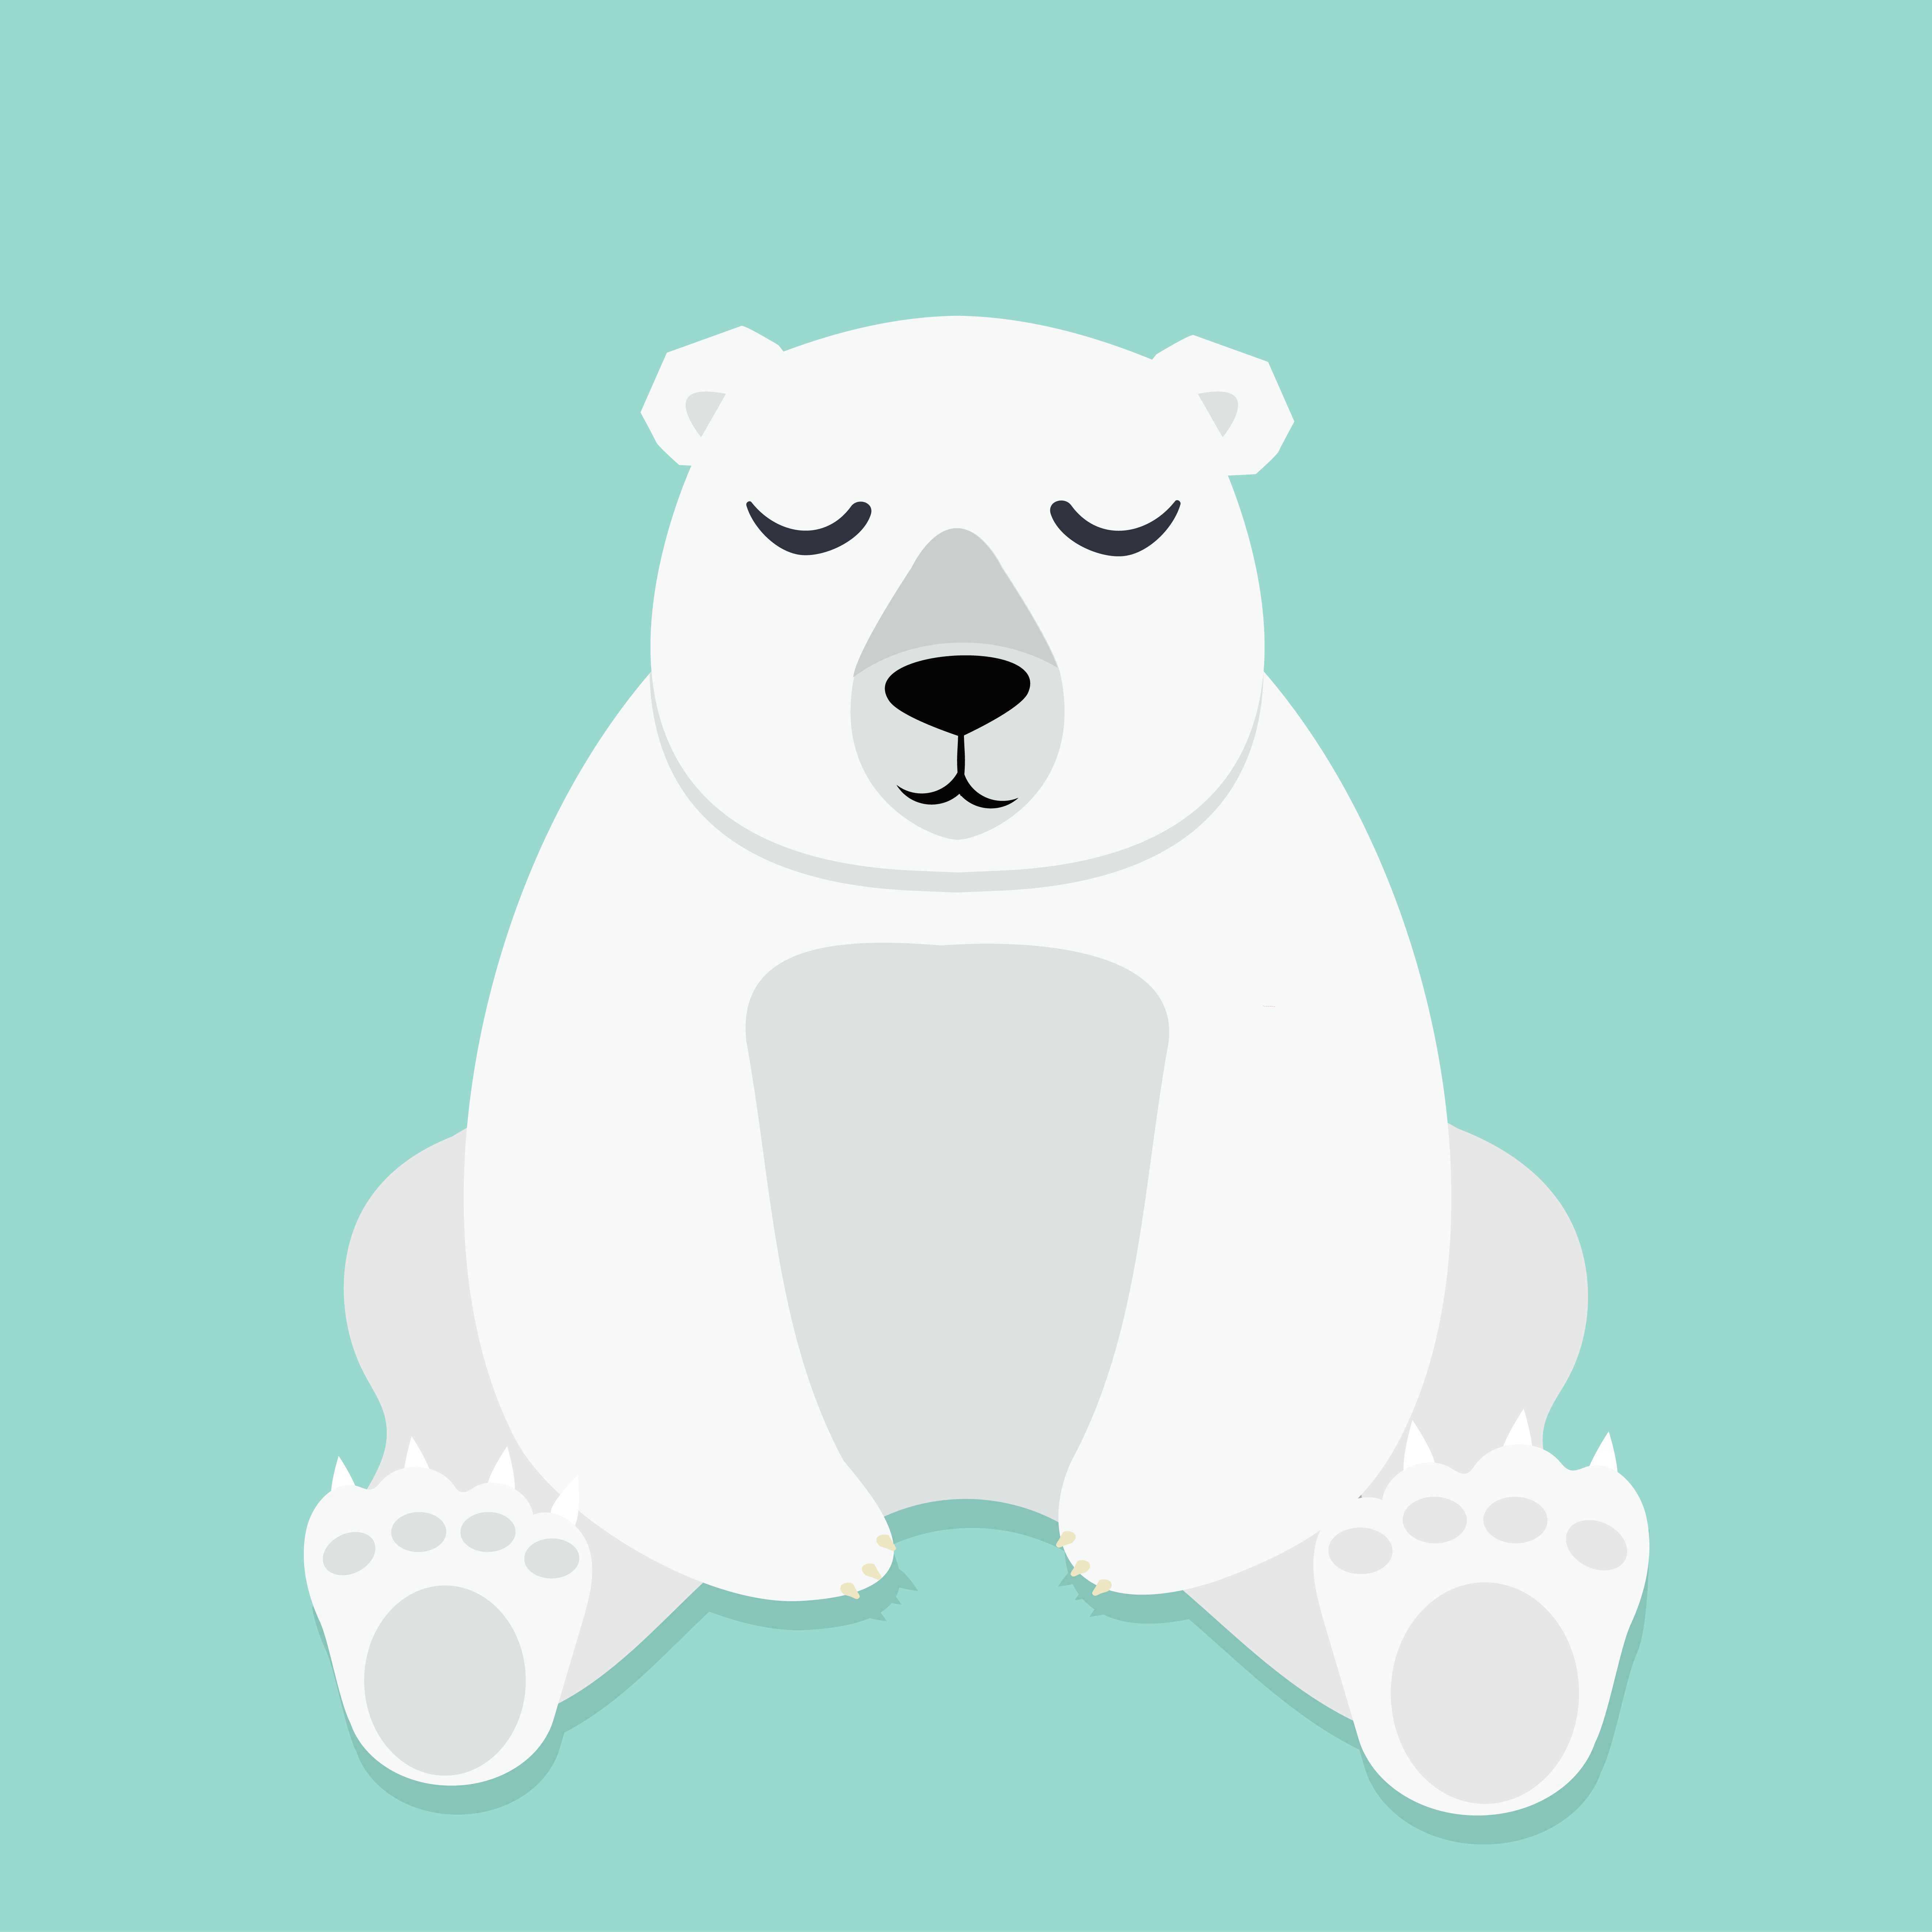 lonely polar bear sitting vector download free vector. Black Bedroom Furniture Sets. Home Design Ideas